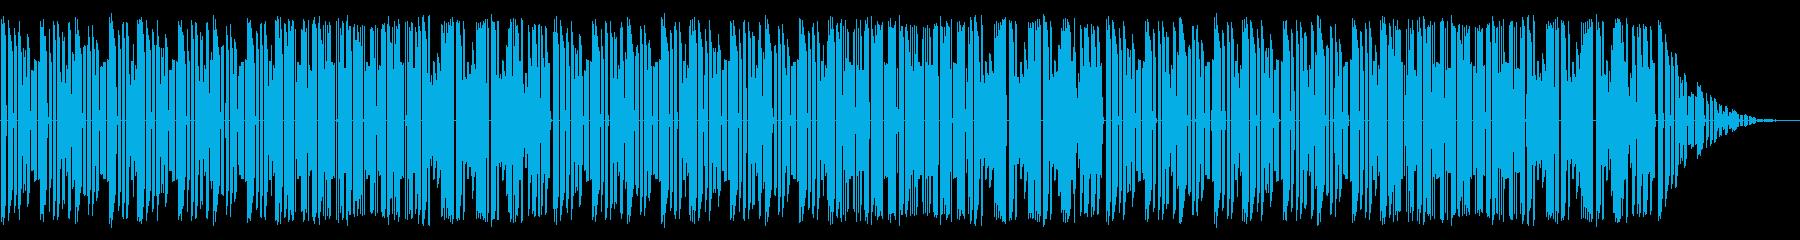 NES 汎用 C05-1(ステージ4) の再生済みの波形